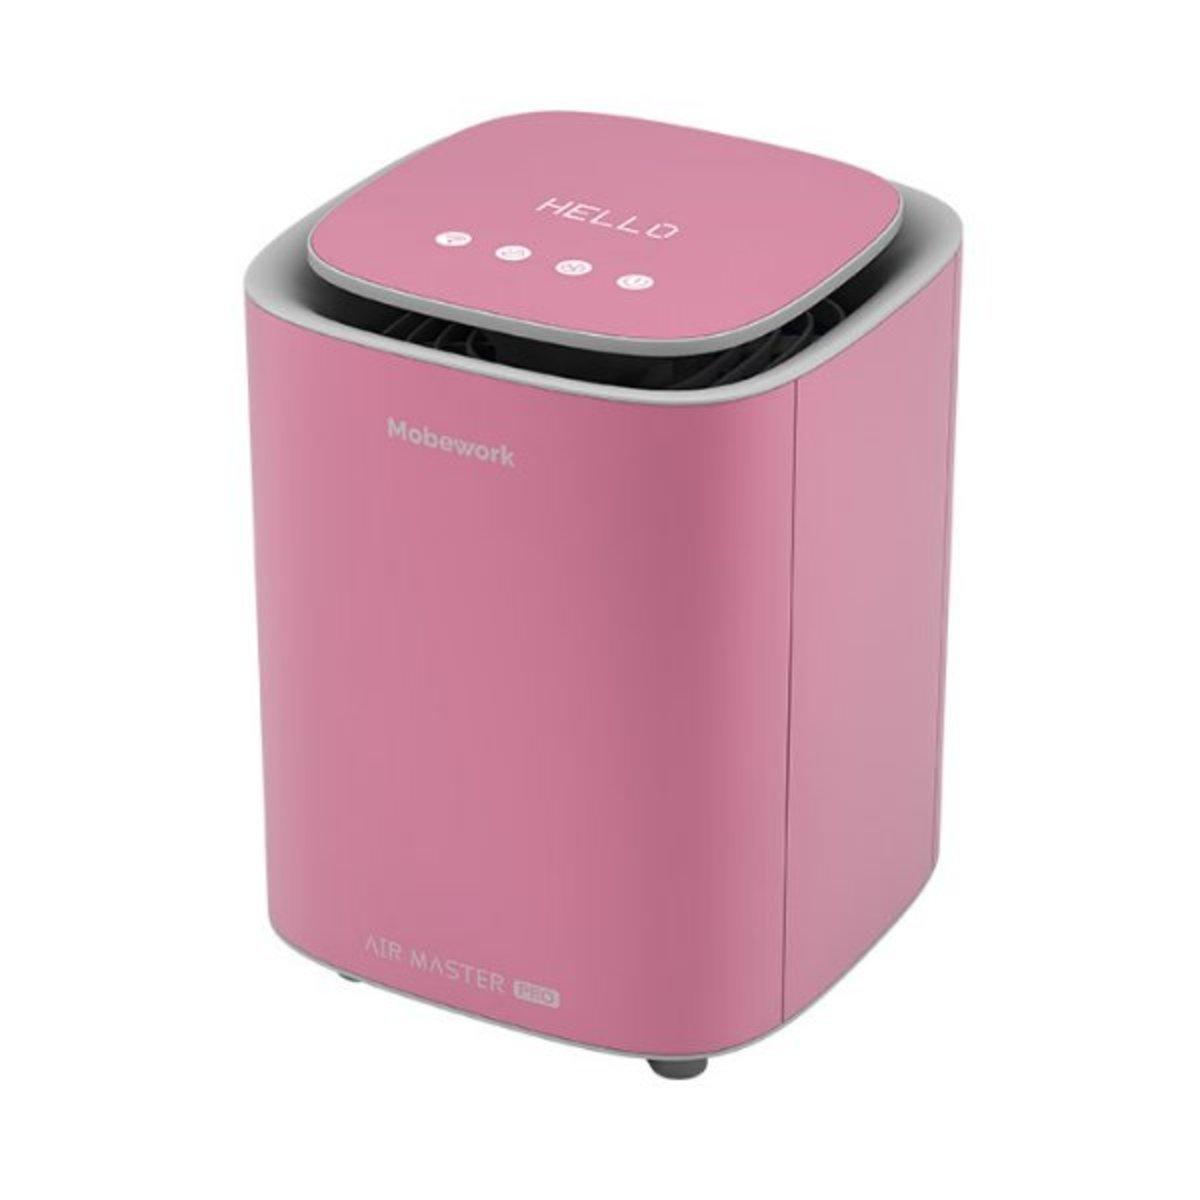 Air Master Pro 智能雷達空氣淨化器 - 粉紅色